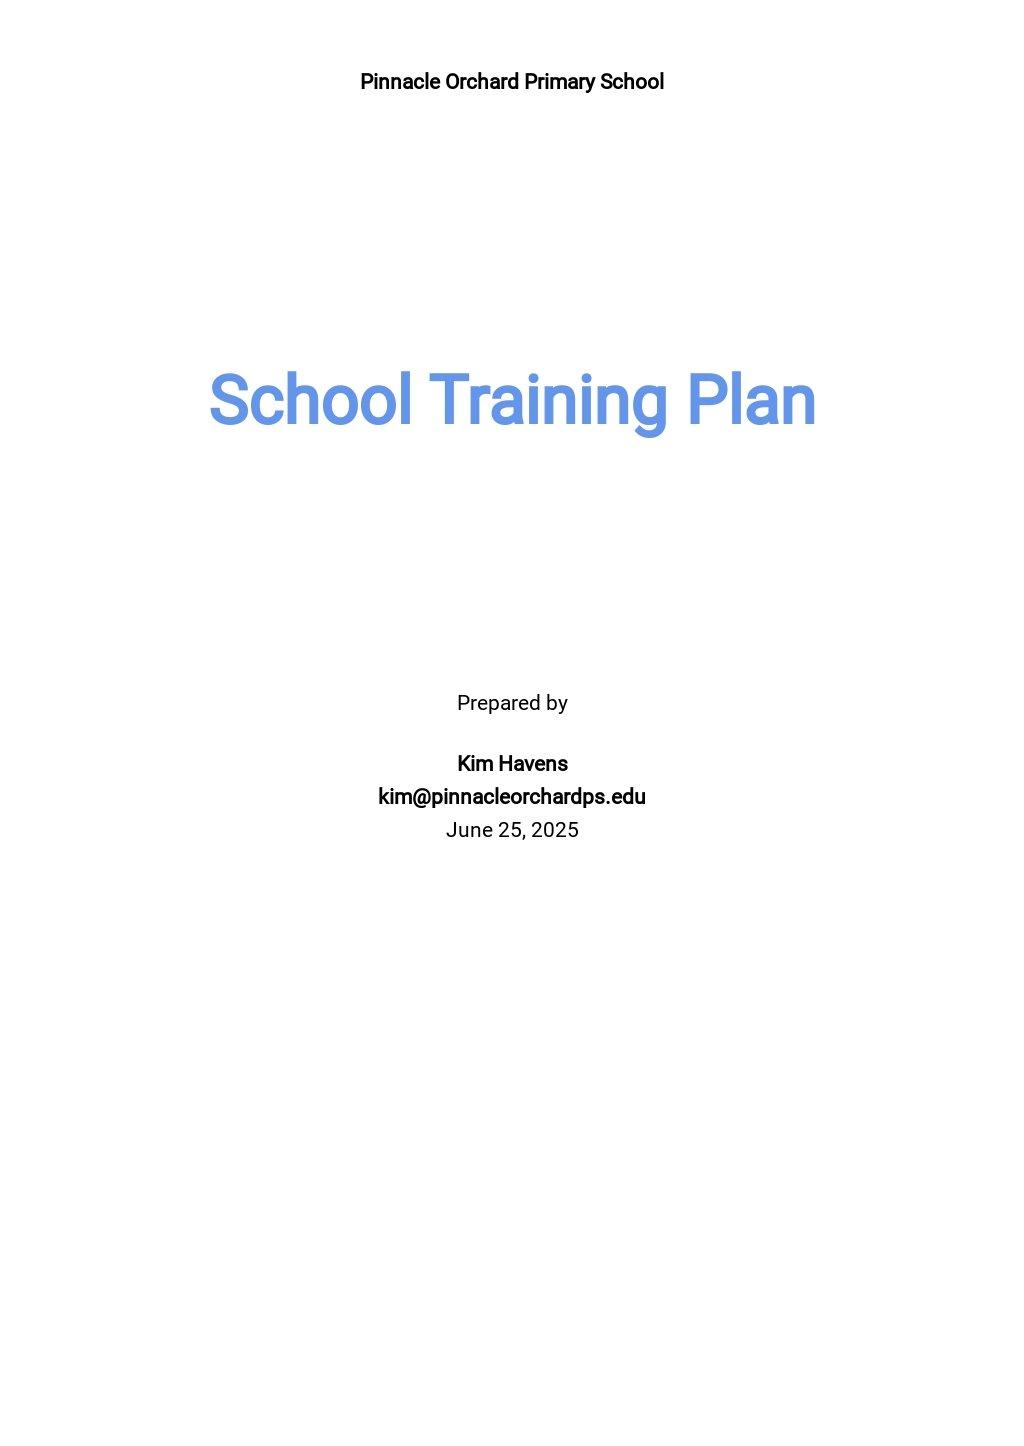 School Training Plan Template